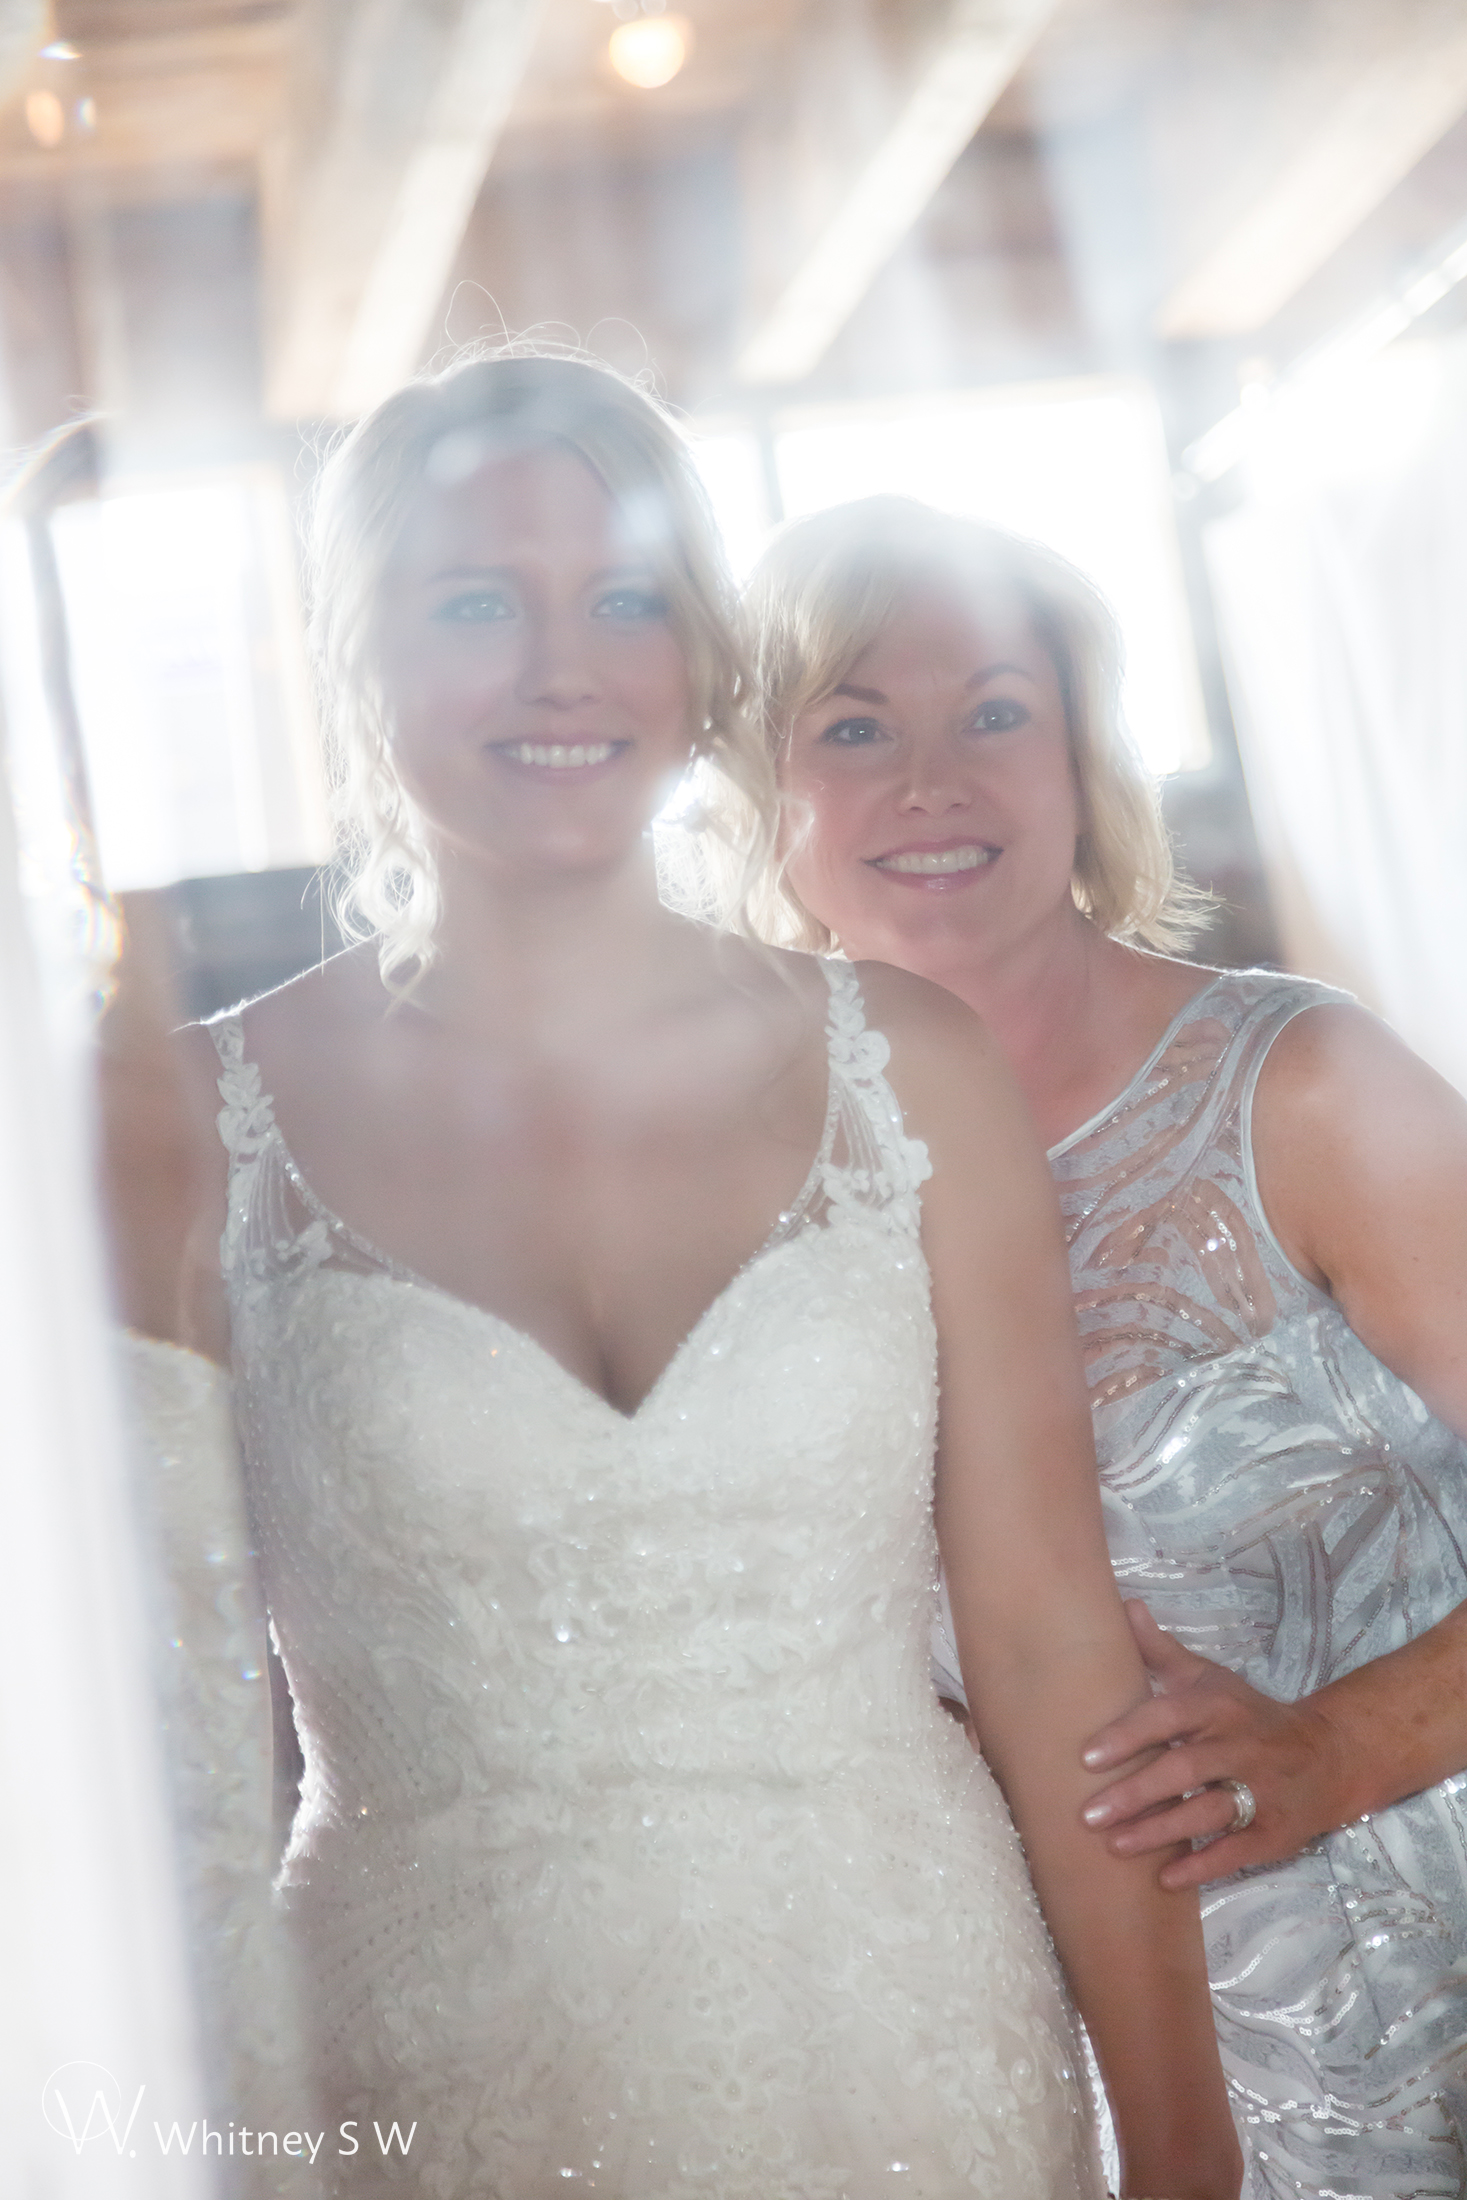 Morgan & Kaivon Wedding - Photography by Whitney S Williams whitneysw (1).jpg